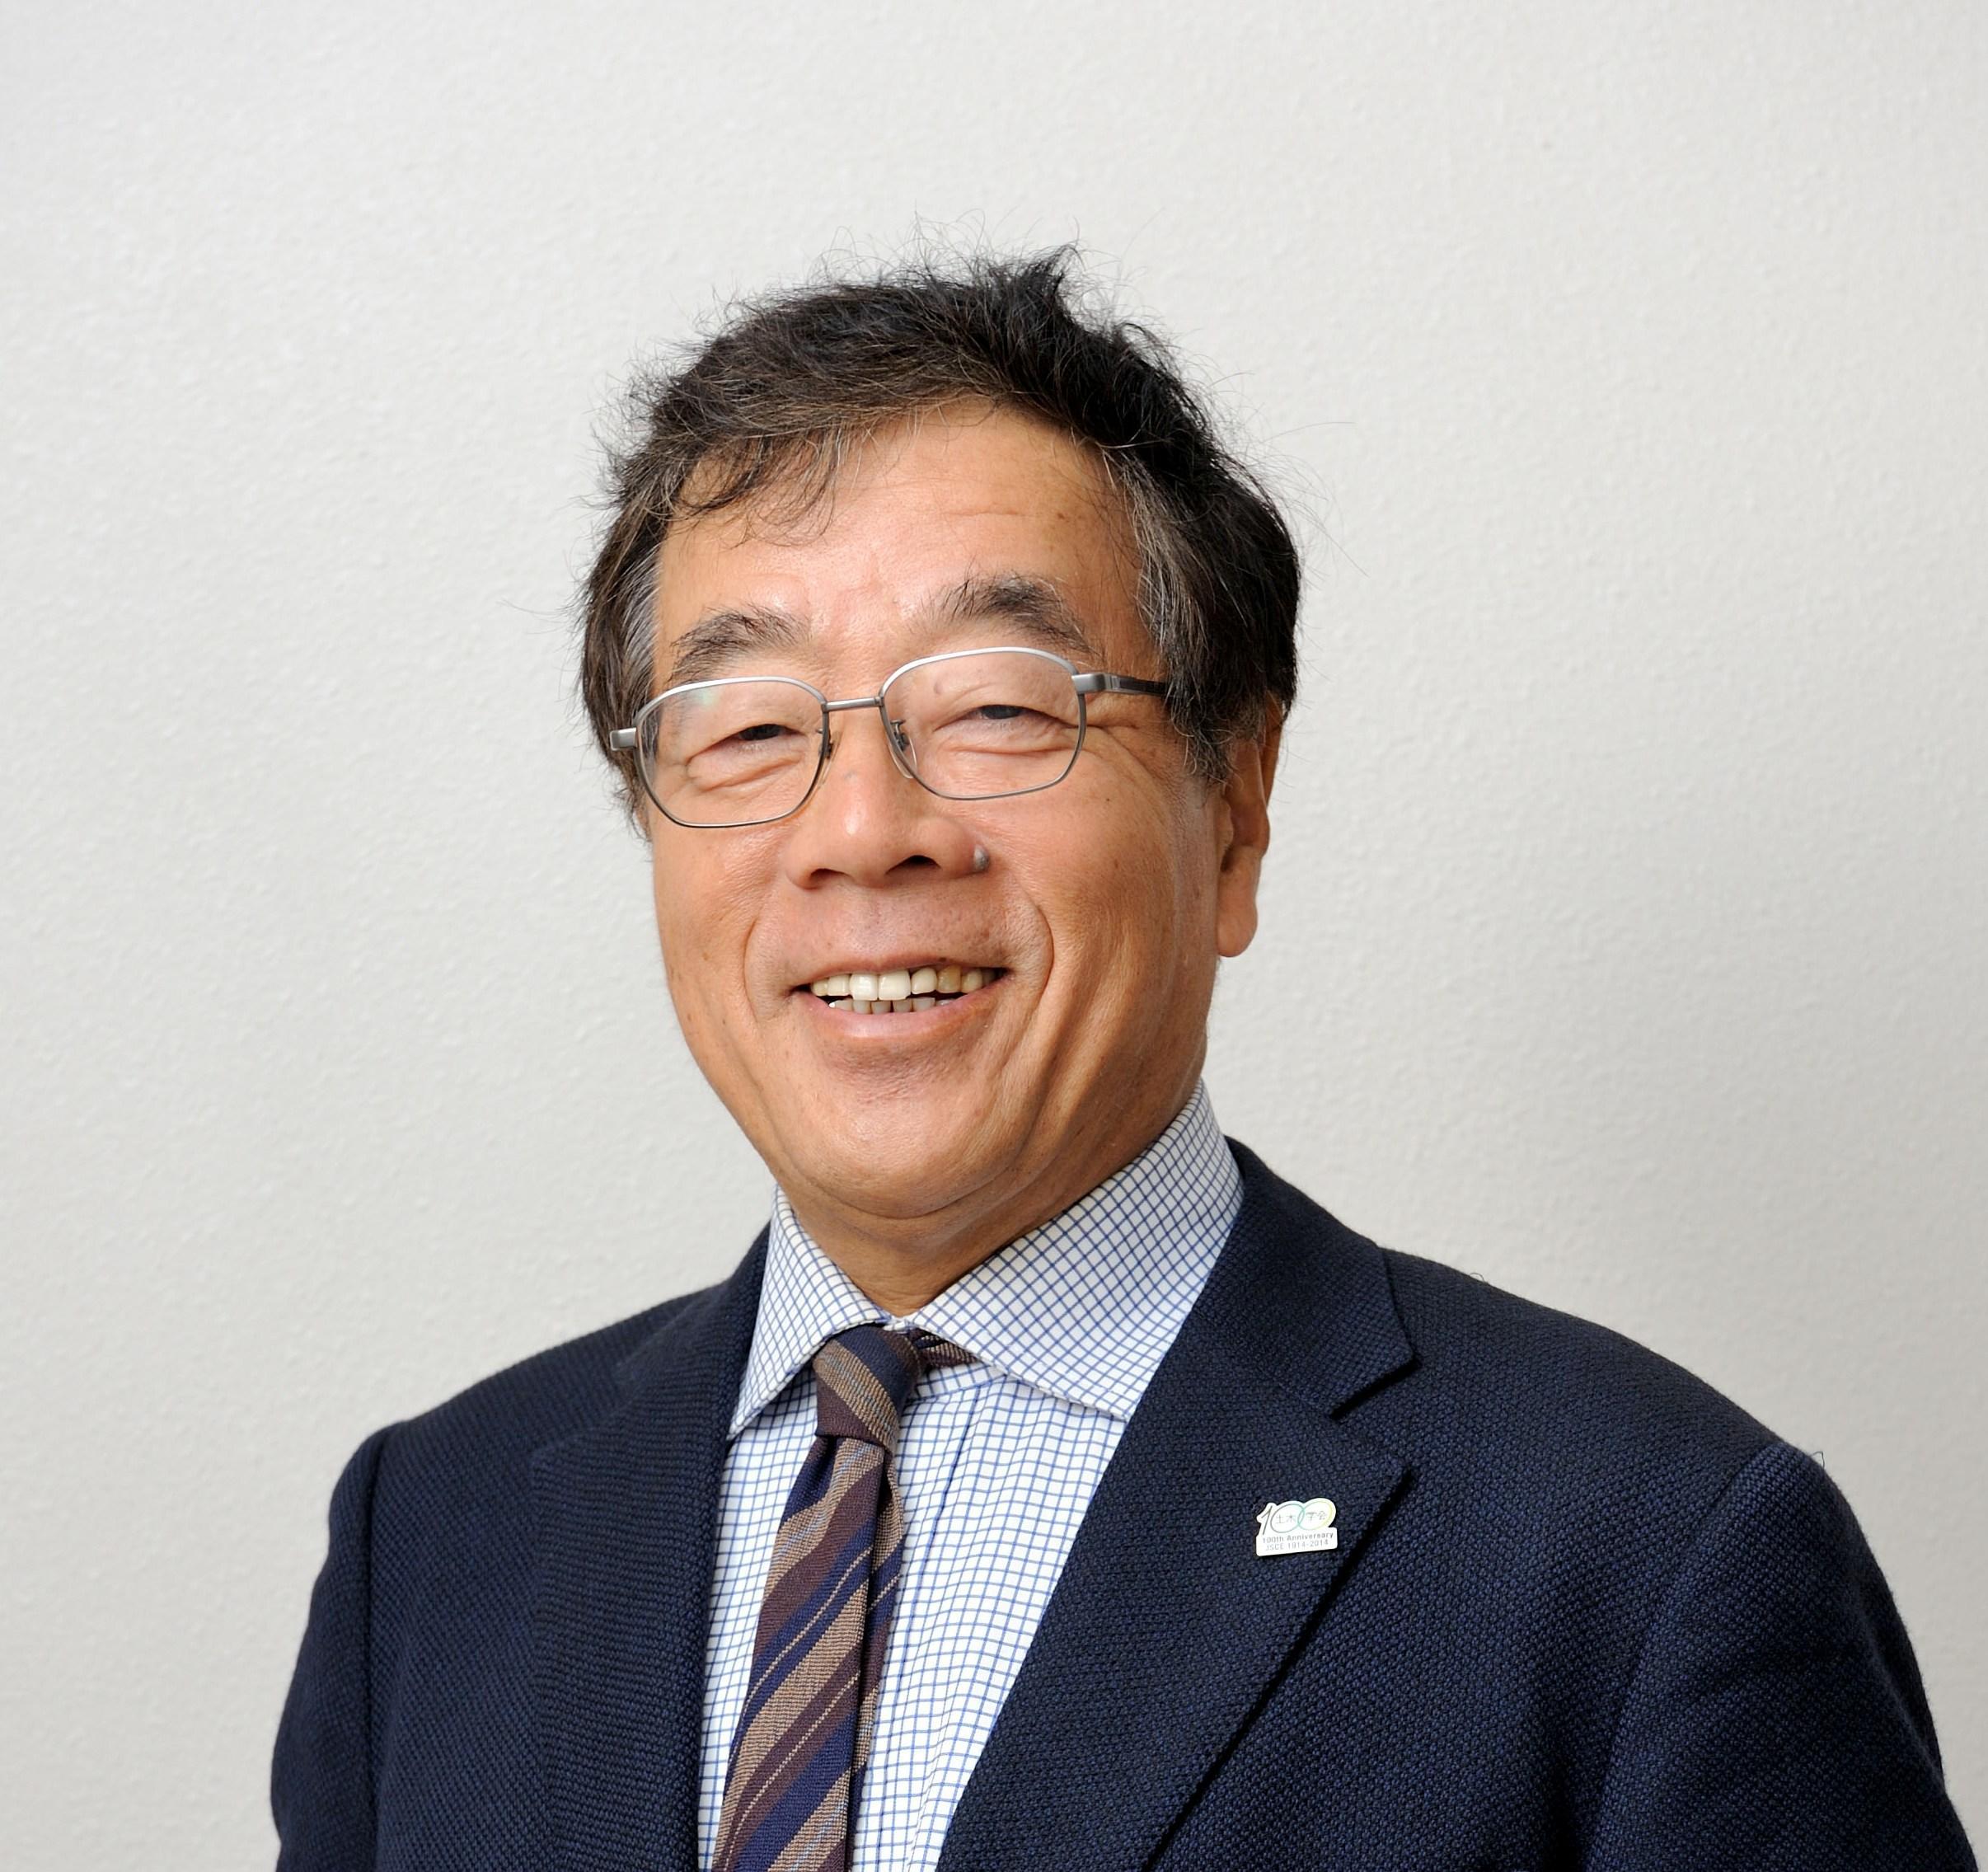 城西大学新学長に横浜国立大学上席特別教授の藤野陽三氏が就任へ